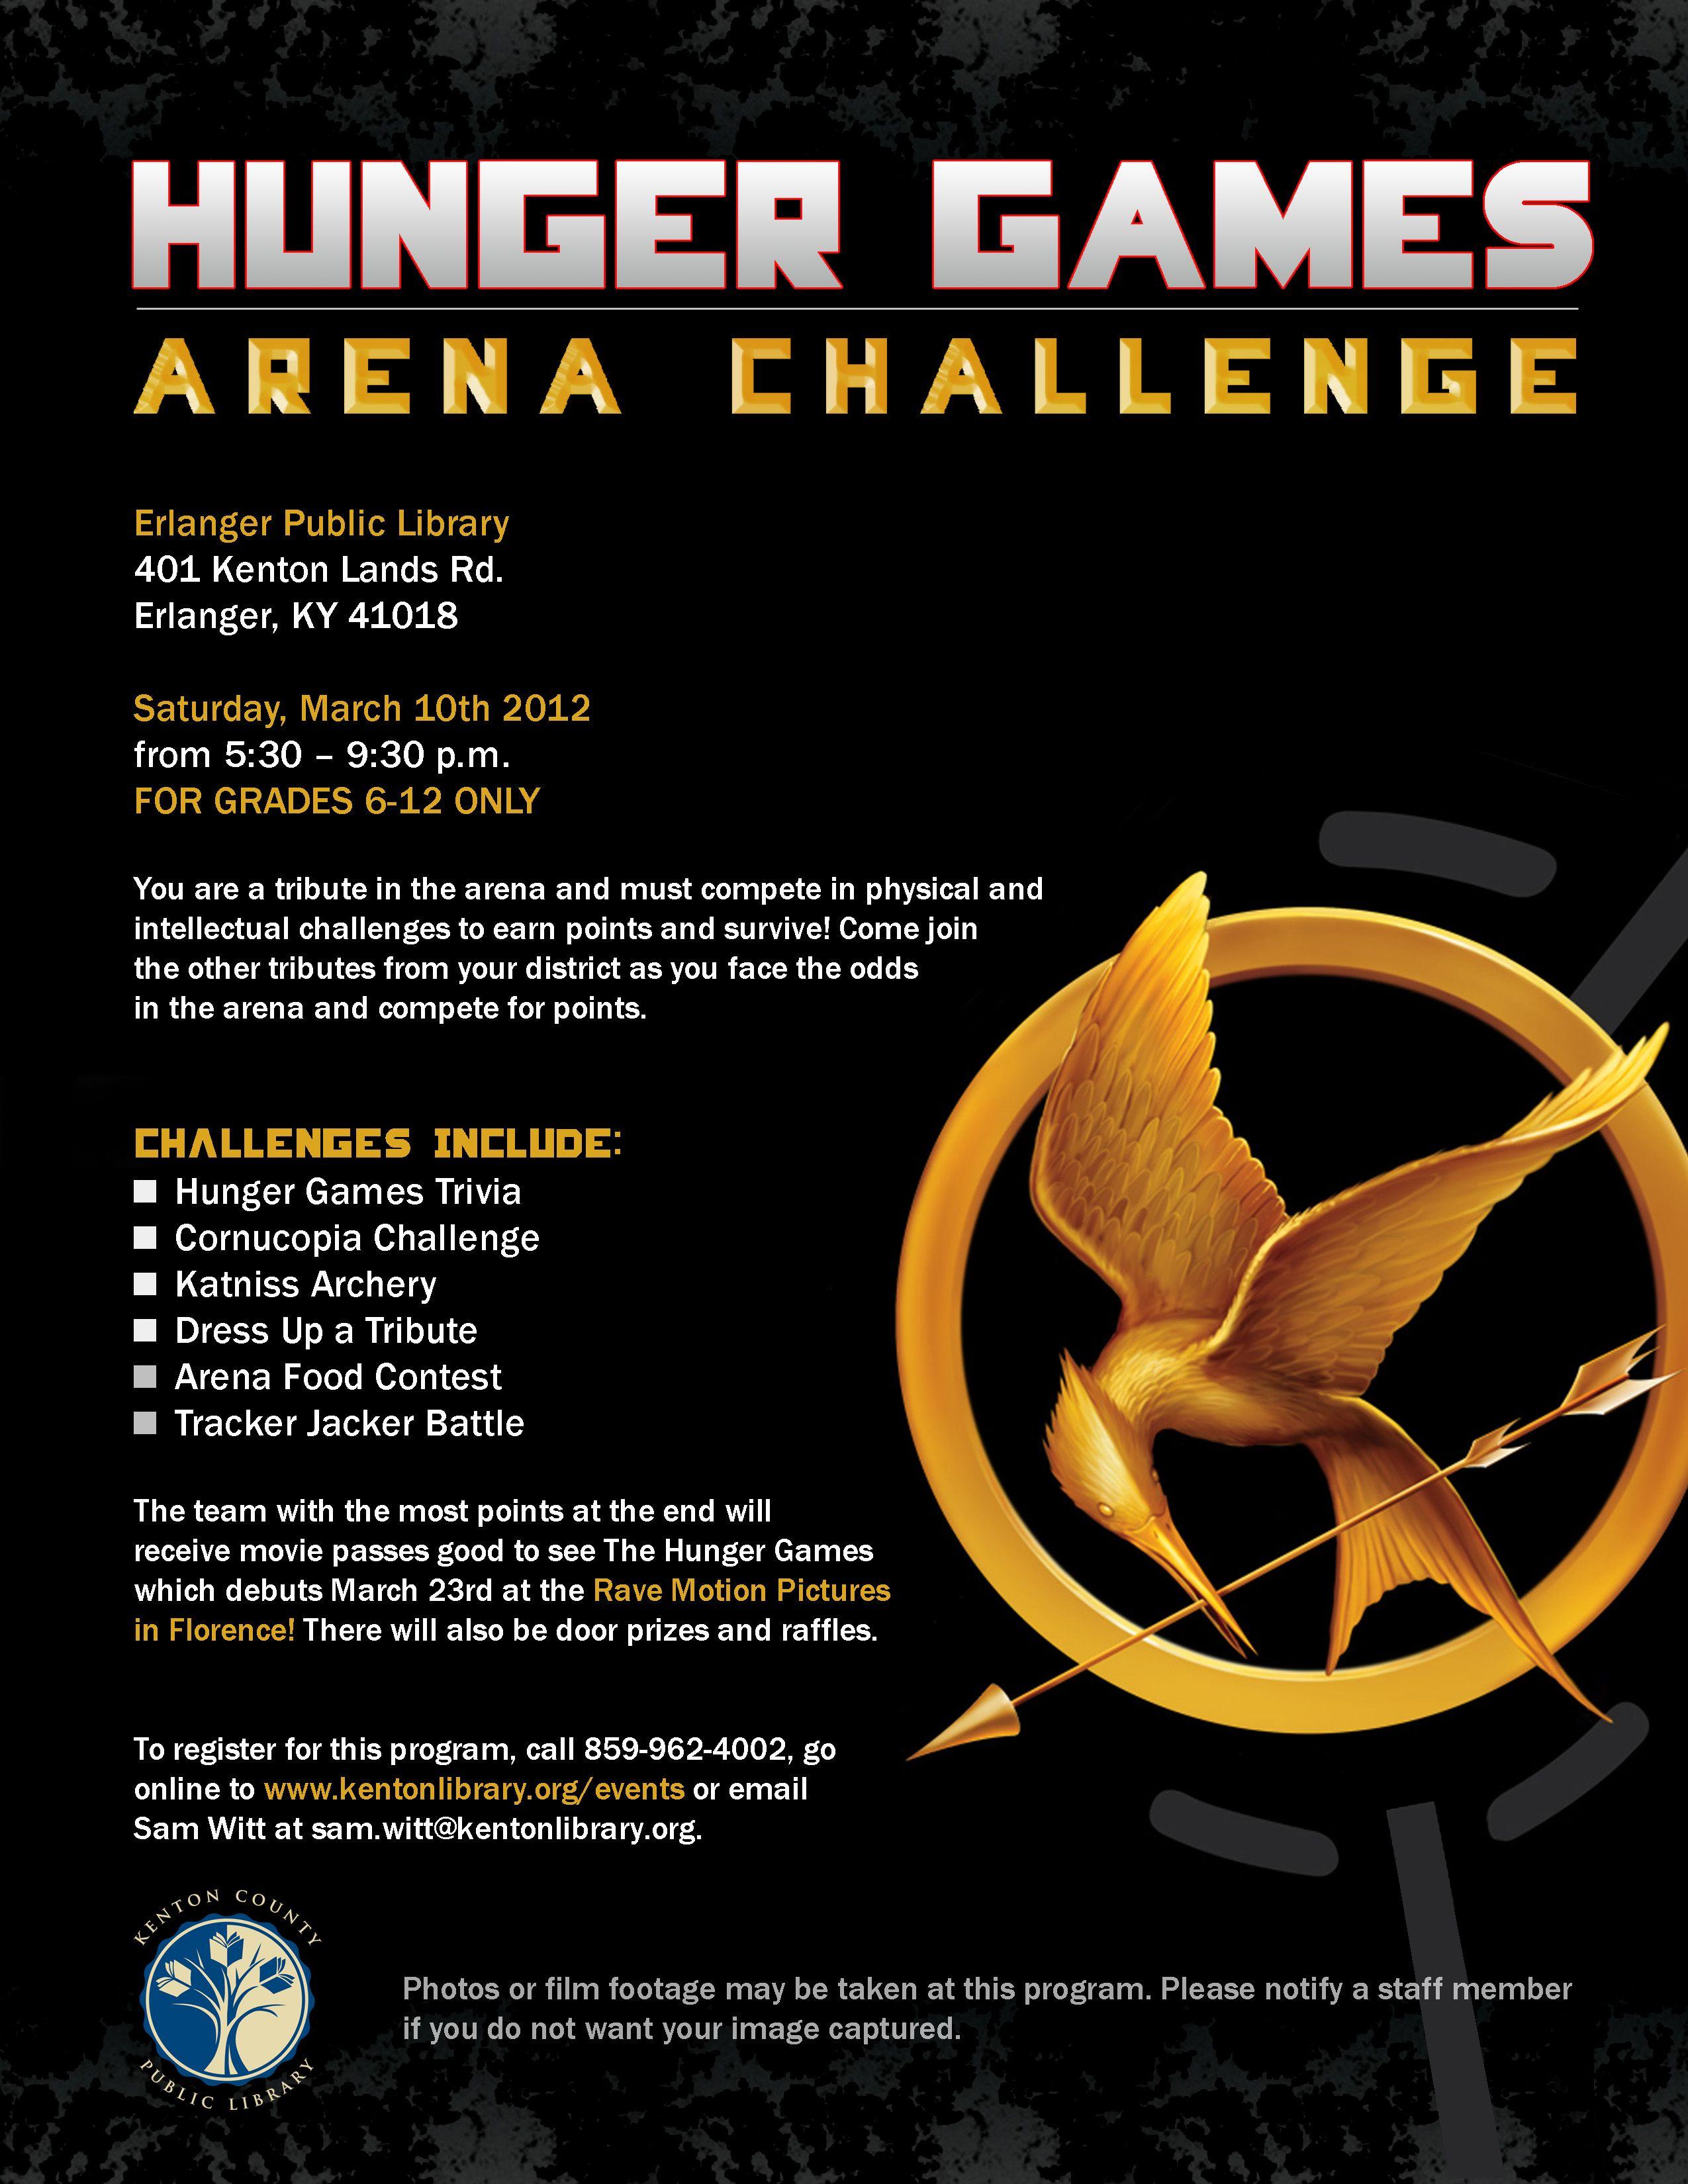 Hunger Games Arena Challenge Summer Reading